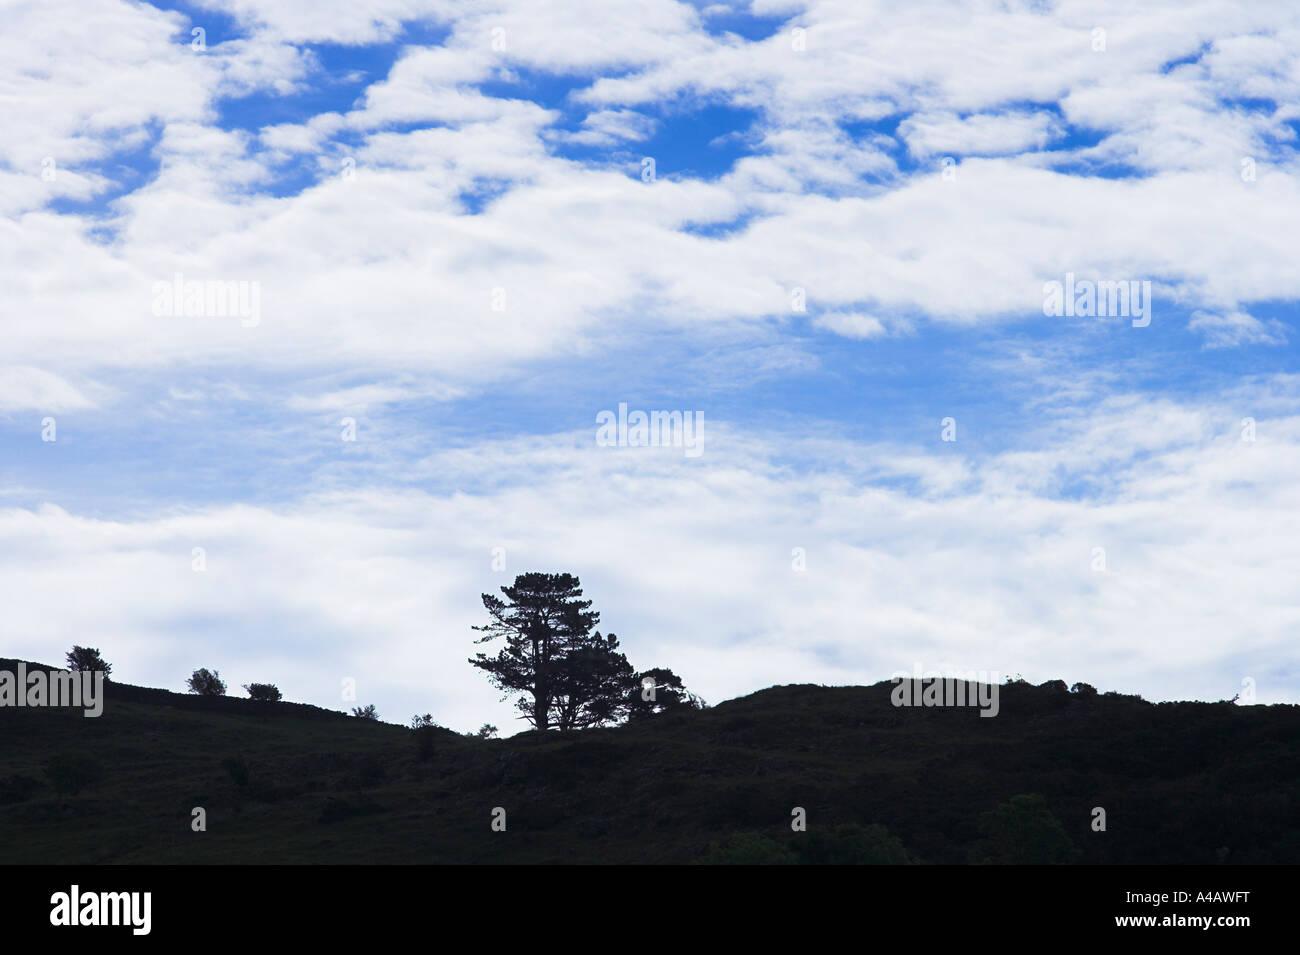 skyline silhouette Welsh mountain - Stock Image